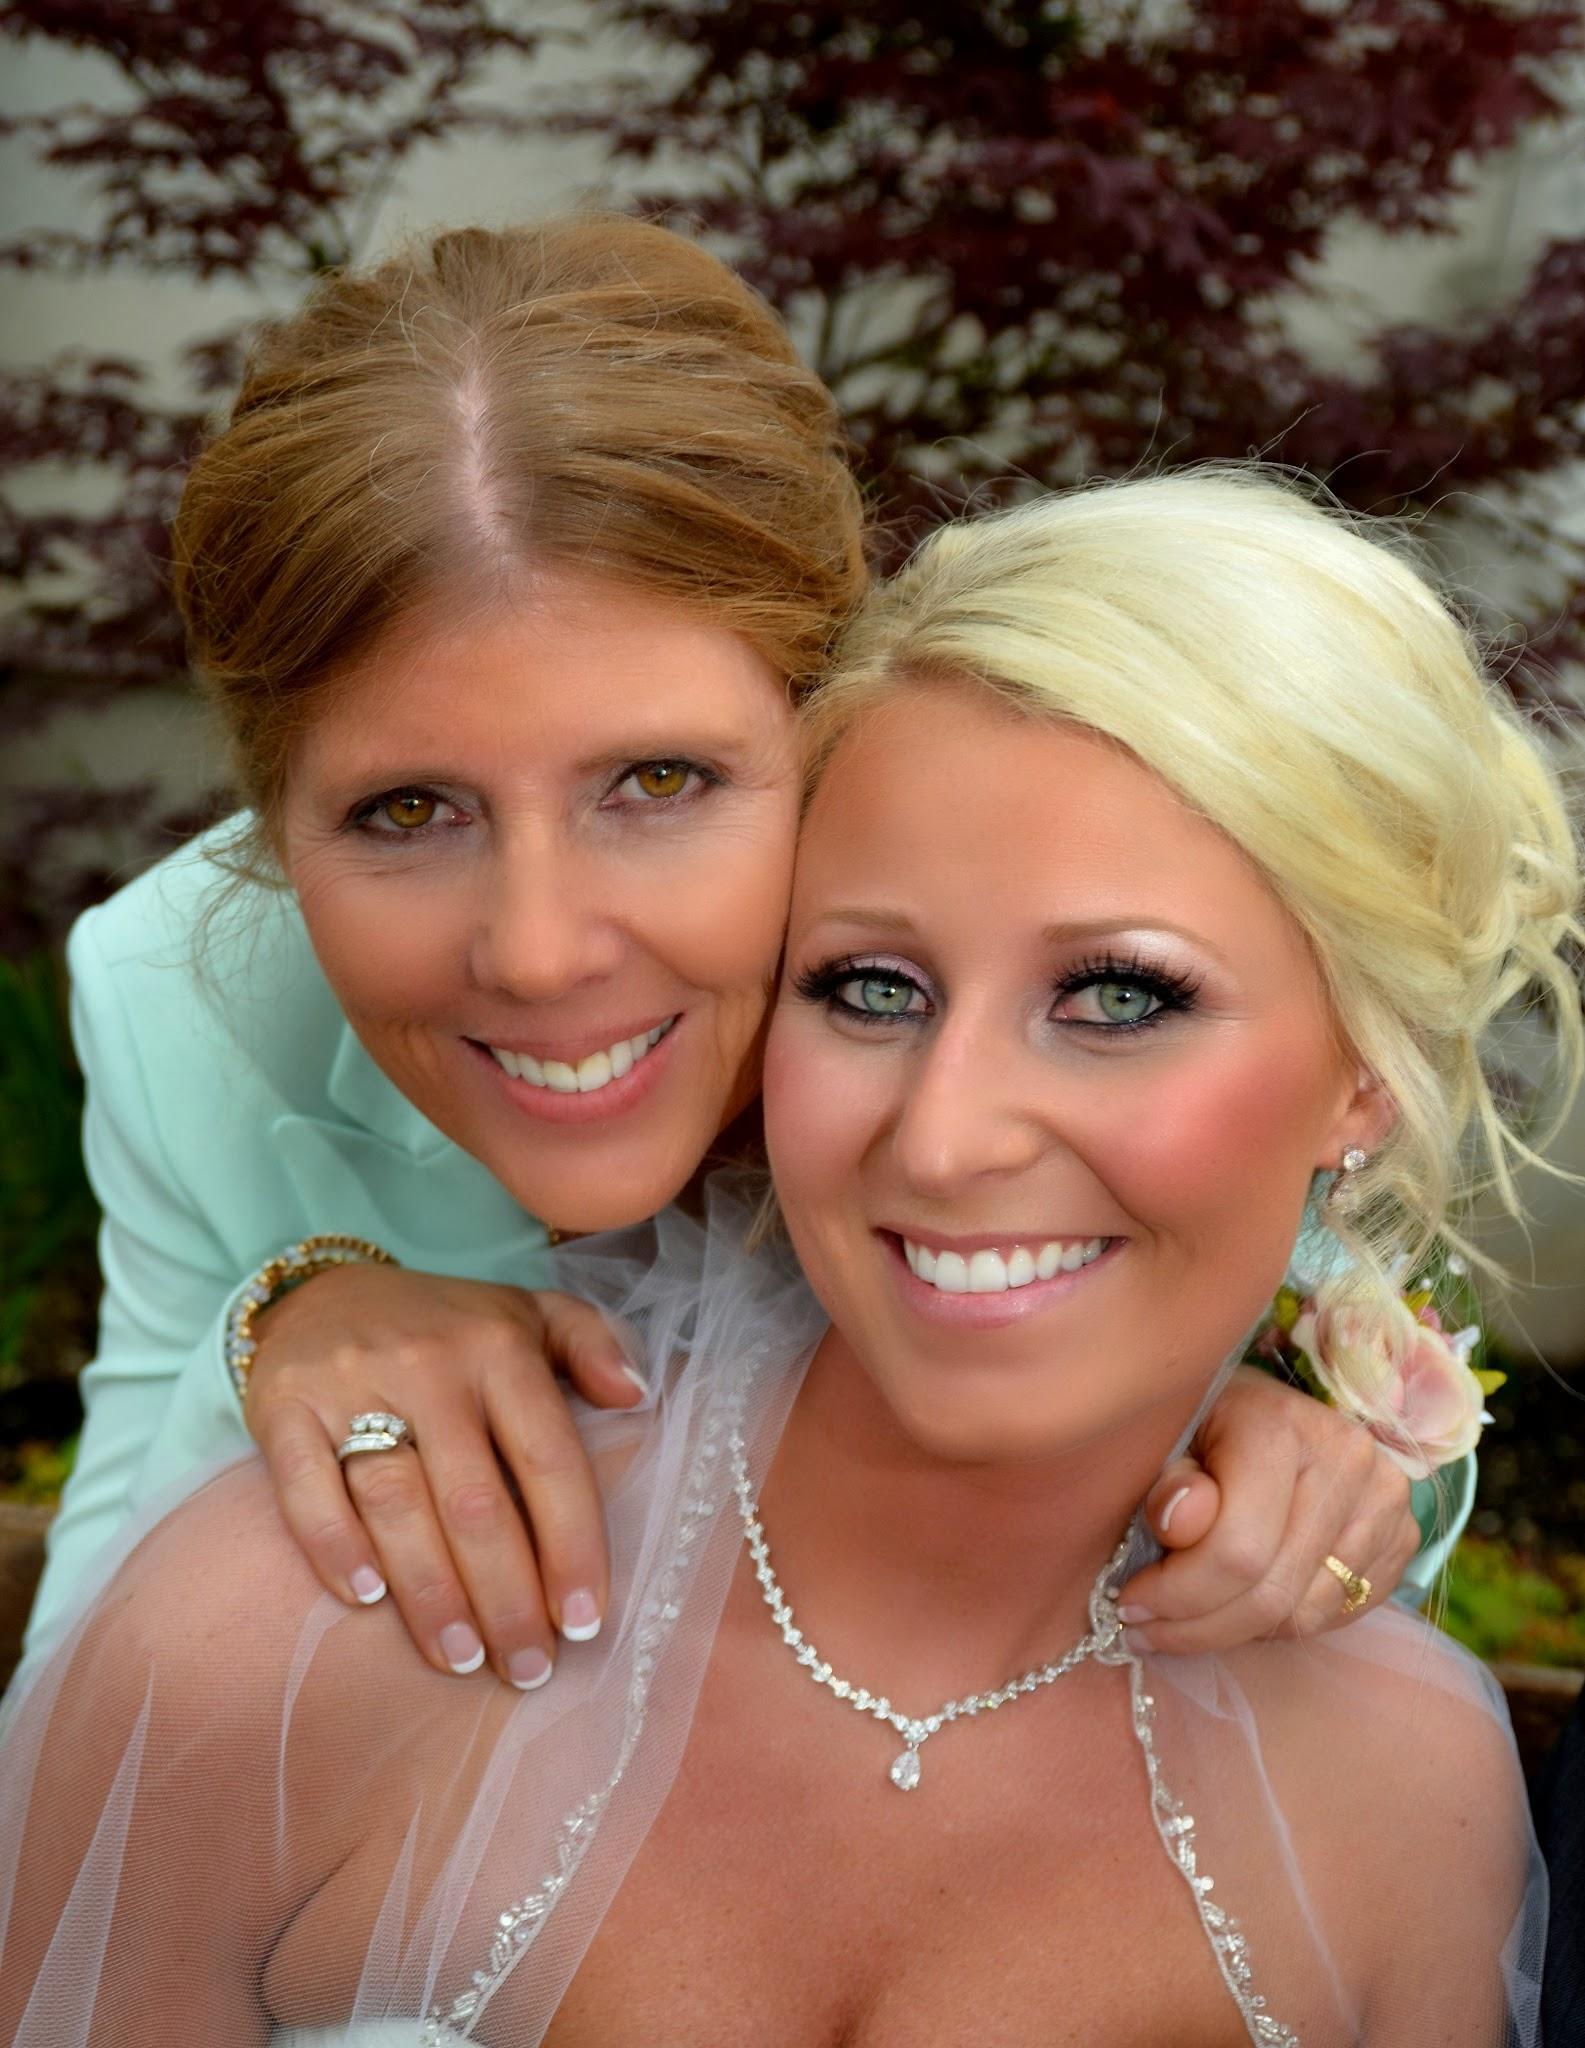 Emilee and Cole_s Wedding Photos 415.5.jpg